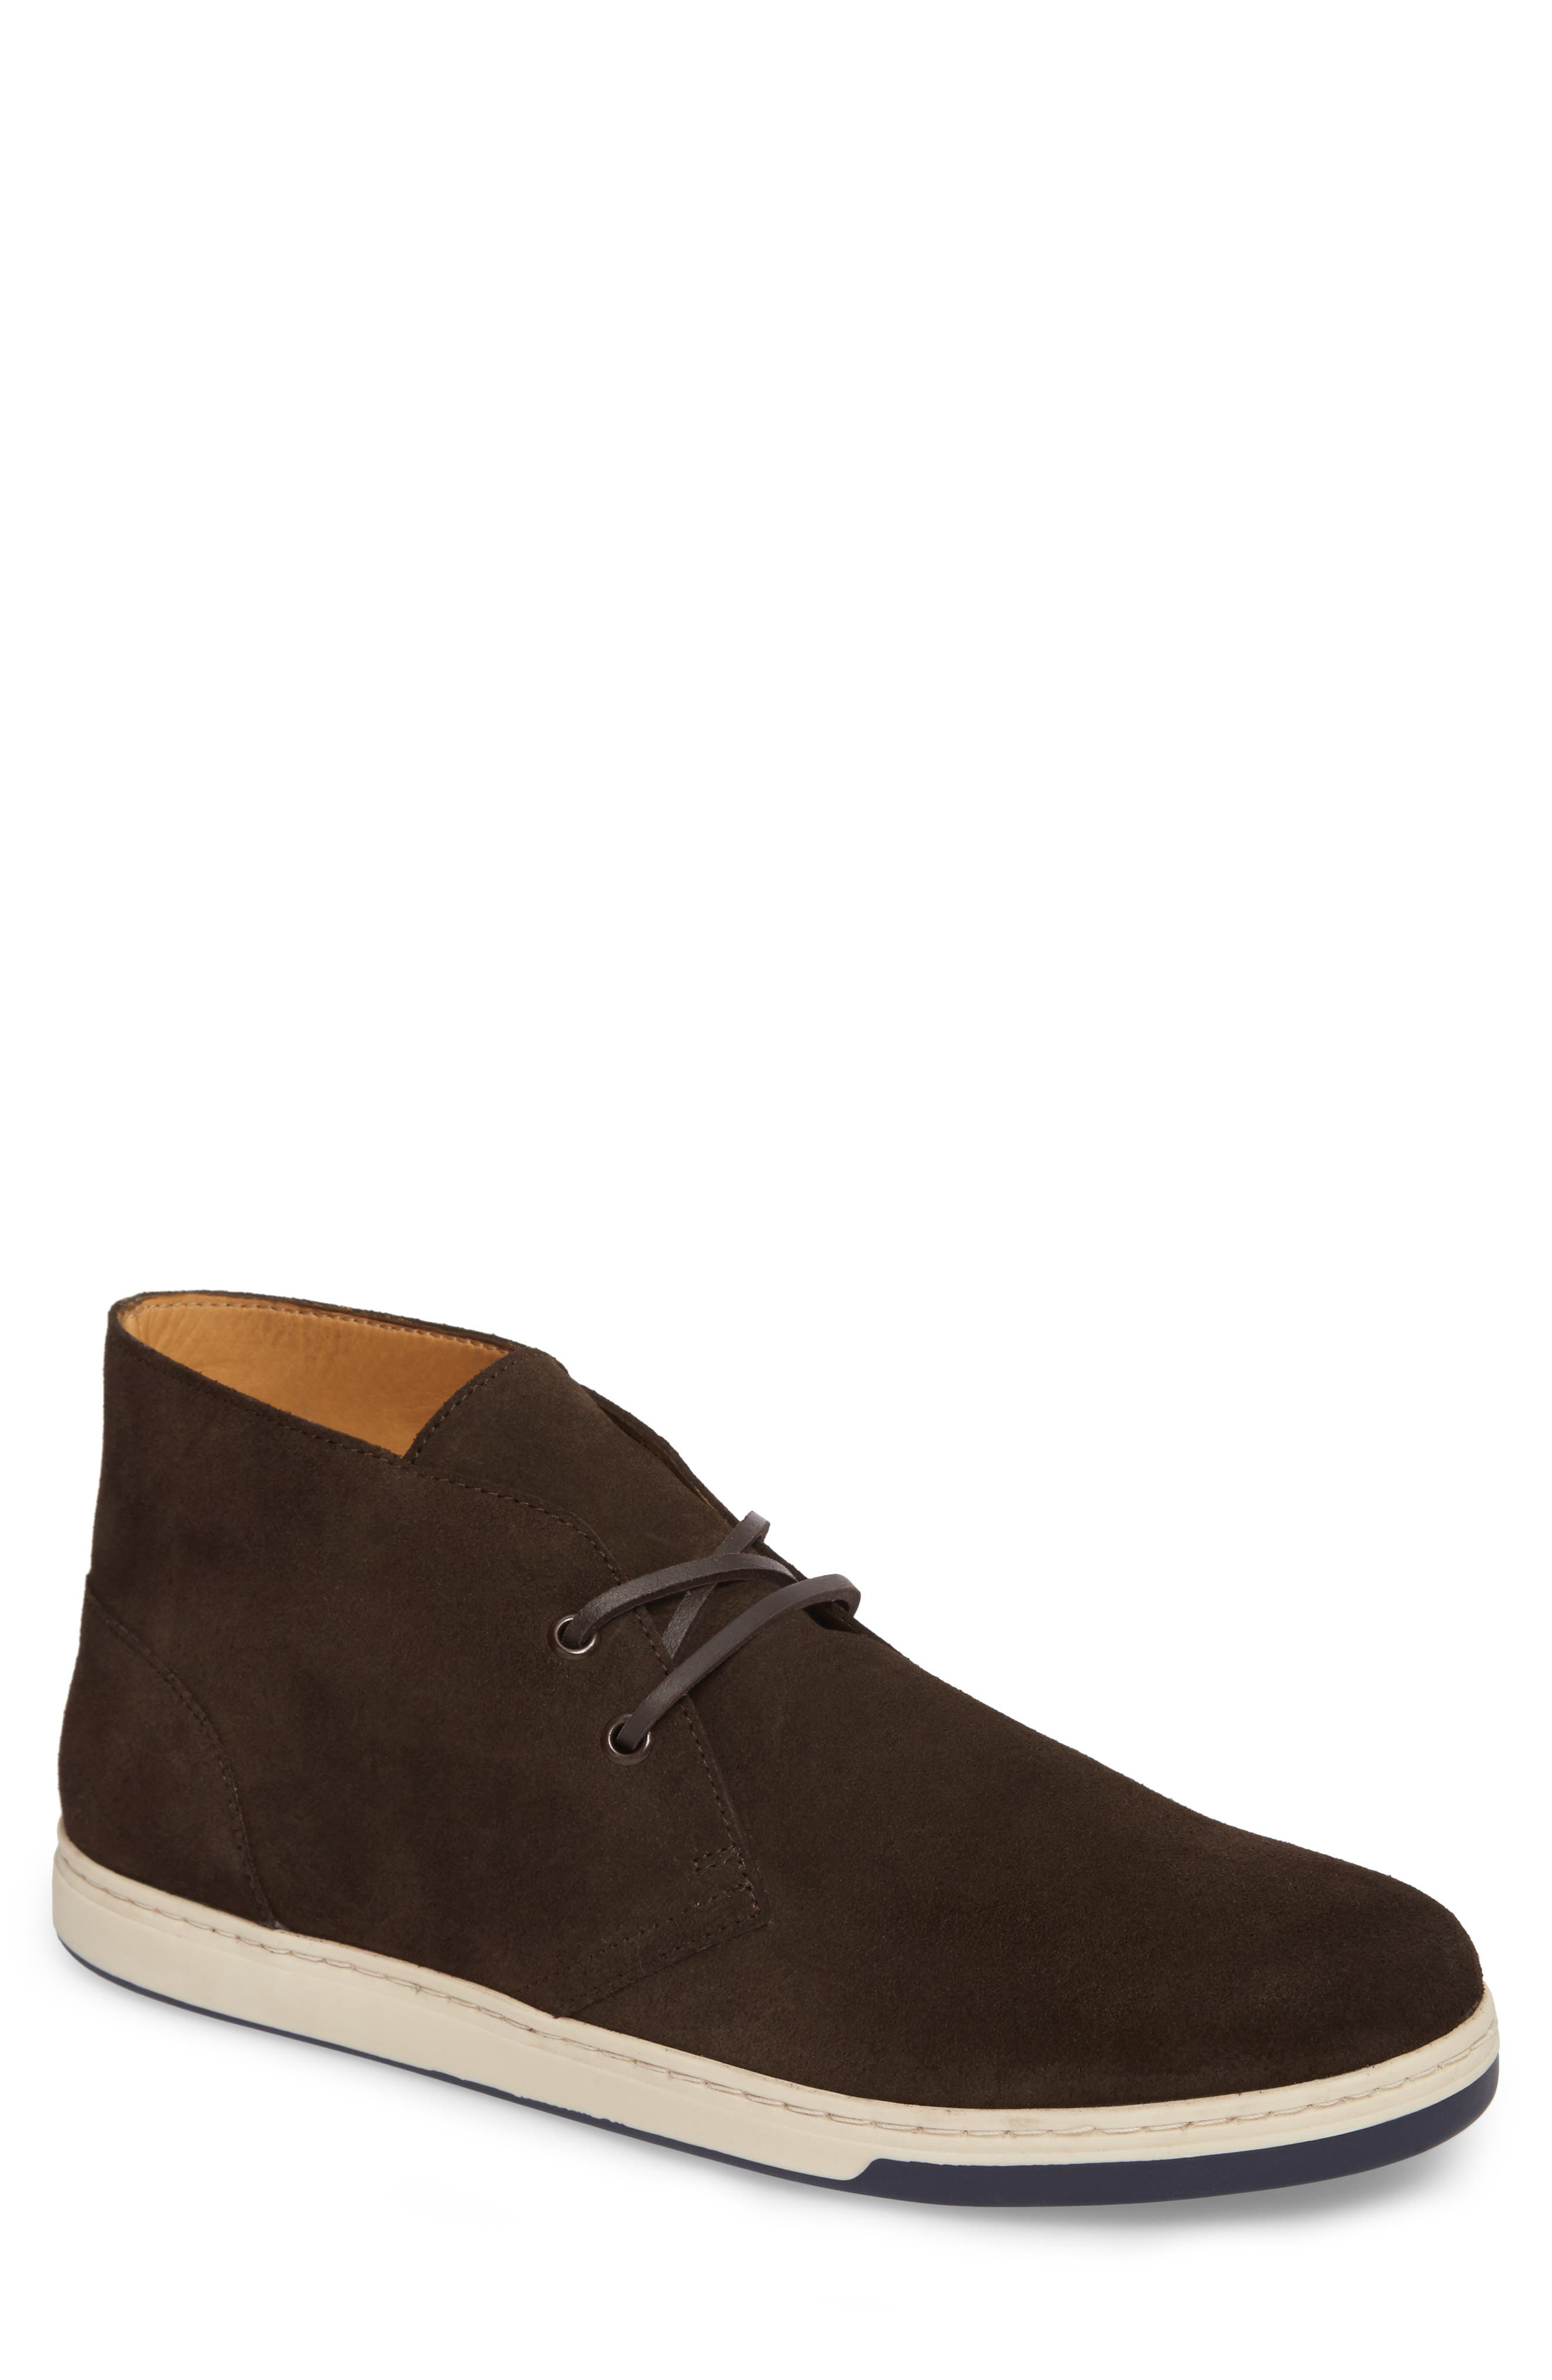 Alternate Image 1 Selected - Austen Heller Berkleys Sneaker (Men)